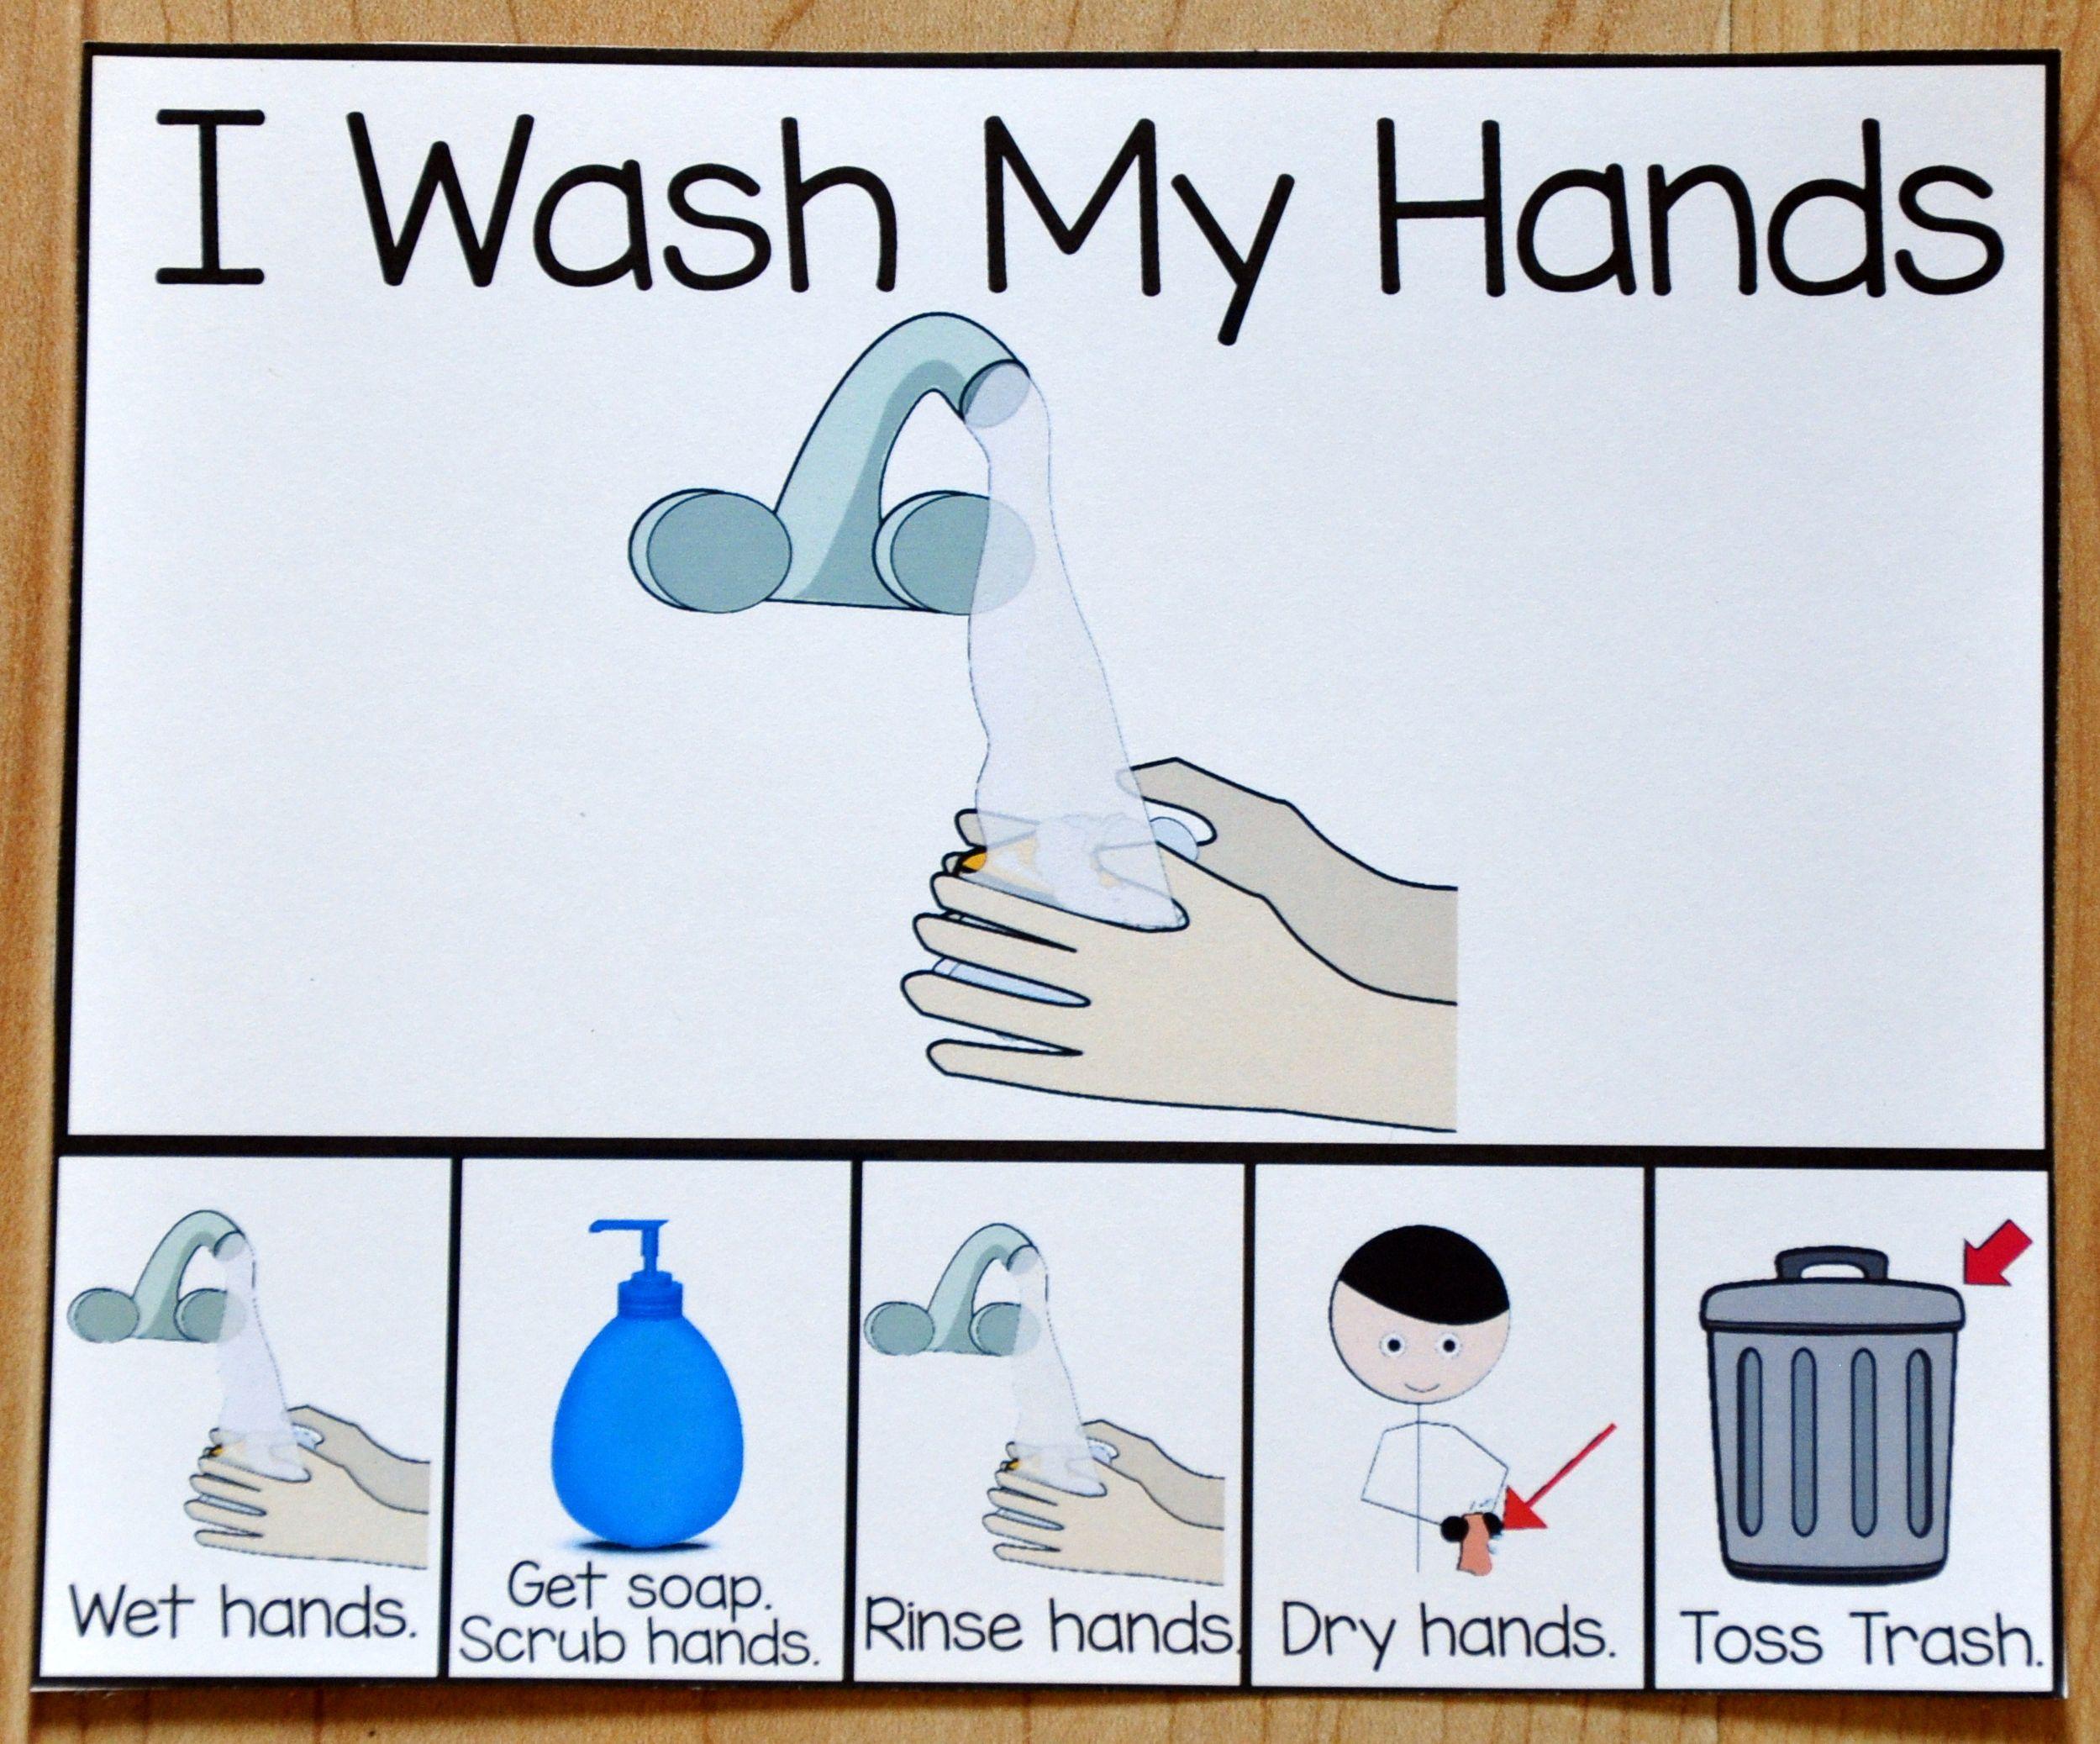 I Wash My Hands Card